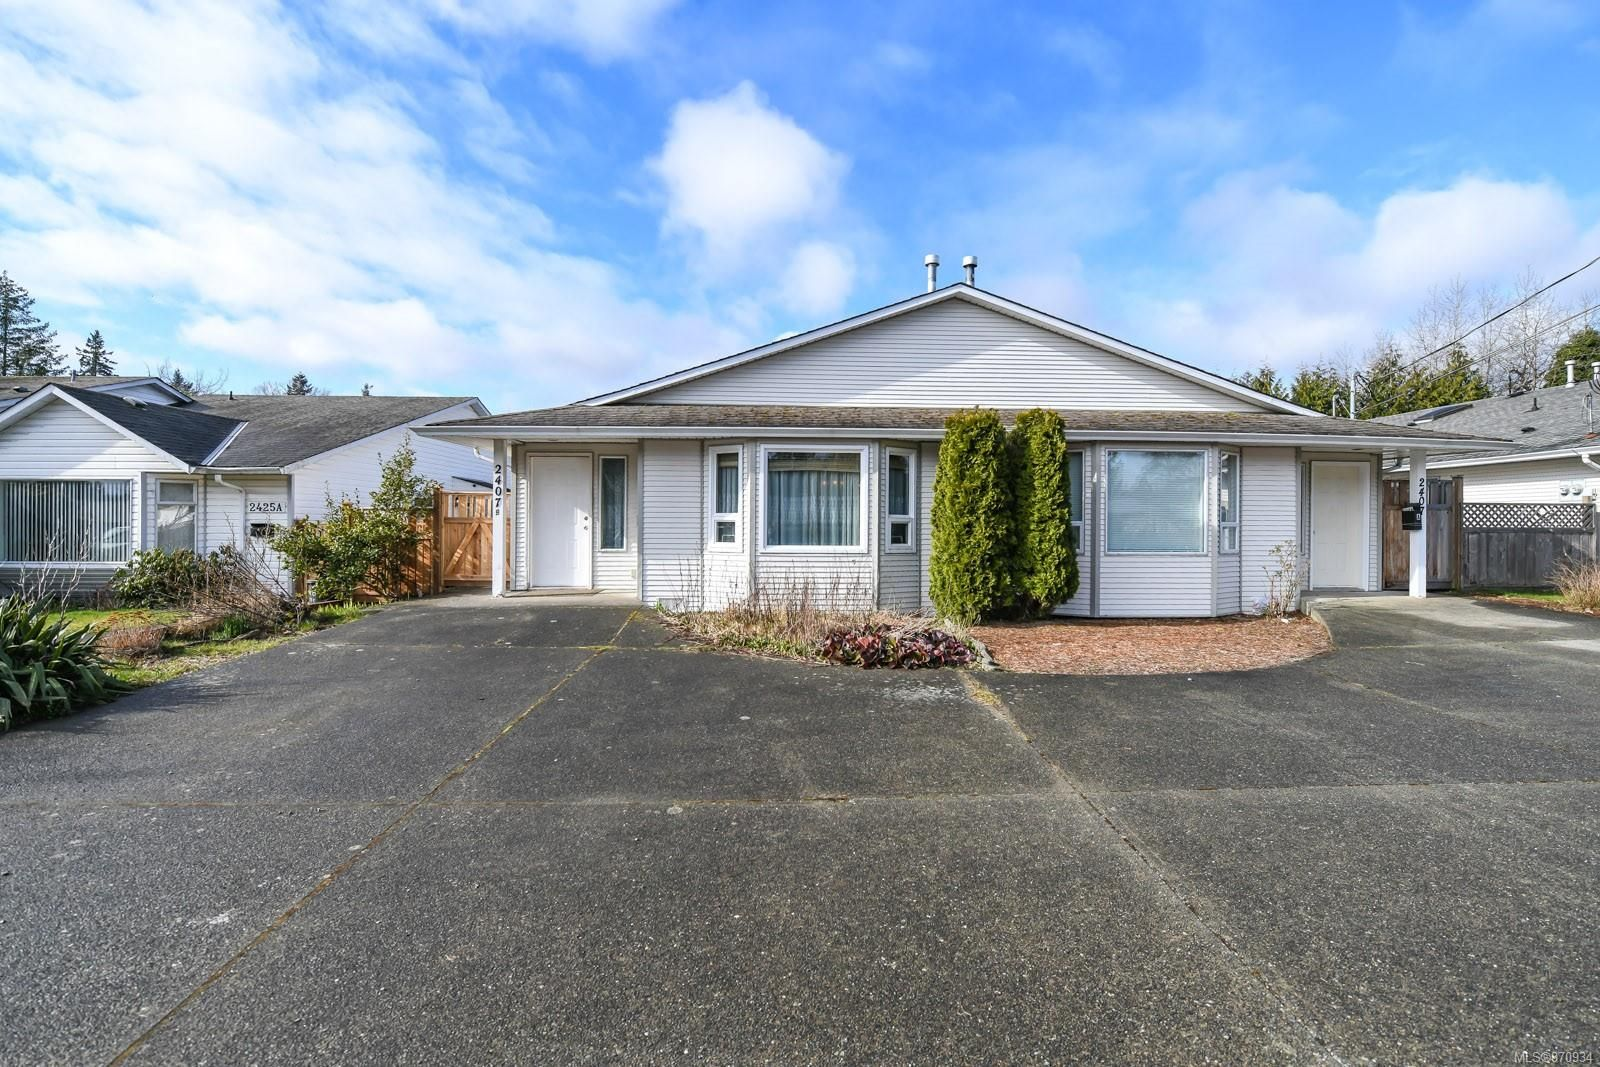 Main Photo: B 2407 Willemar Ave in : CV Courtenay City Half Duplex for sale (Comox Valley)  : MLS®# 870934